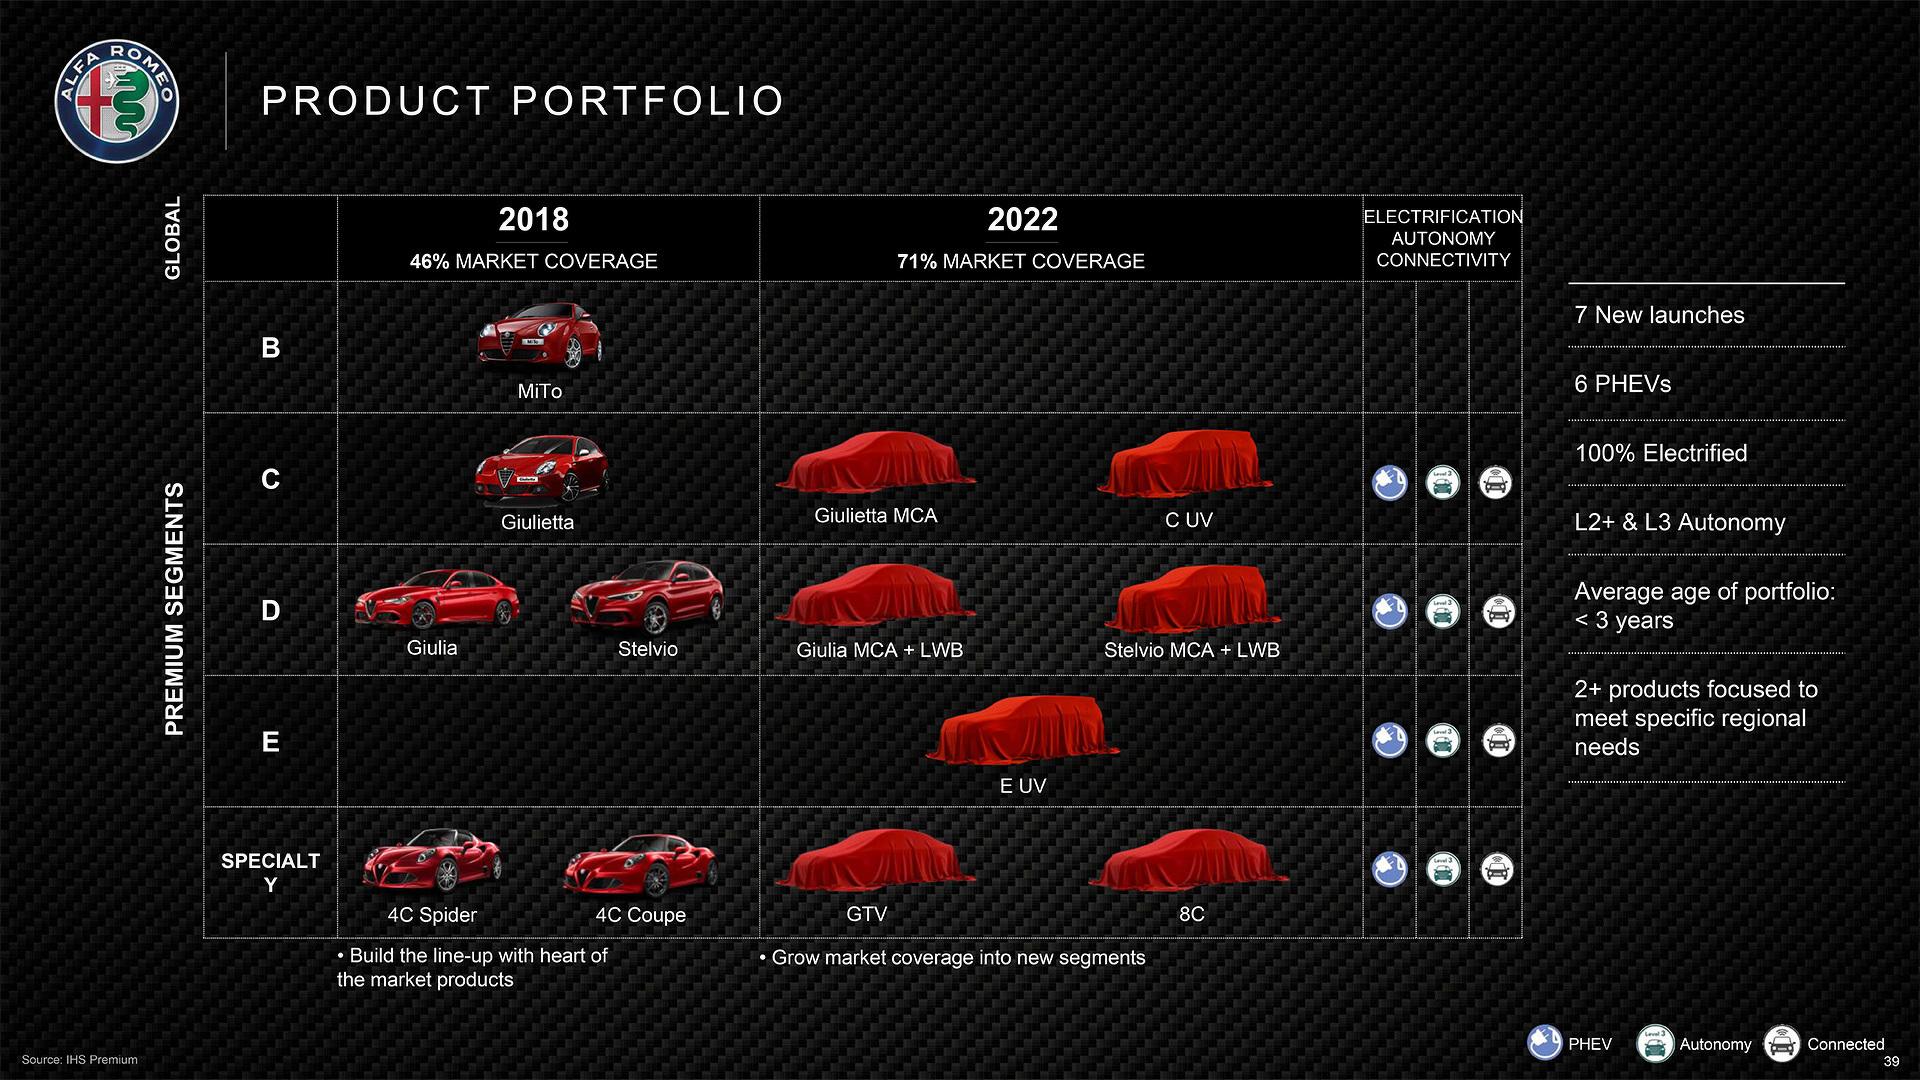 FCA to invest heavily in Maserati, Alfa Romeo luxury brands